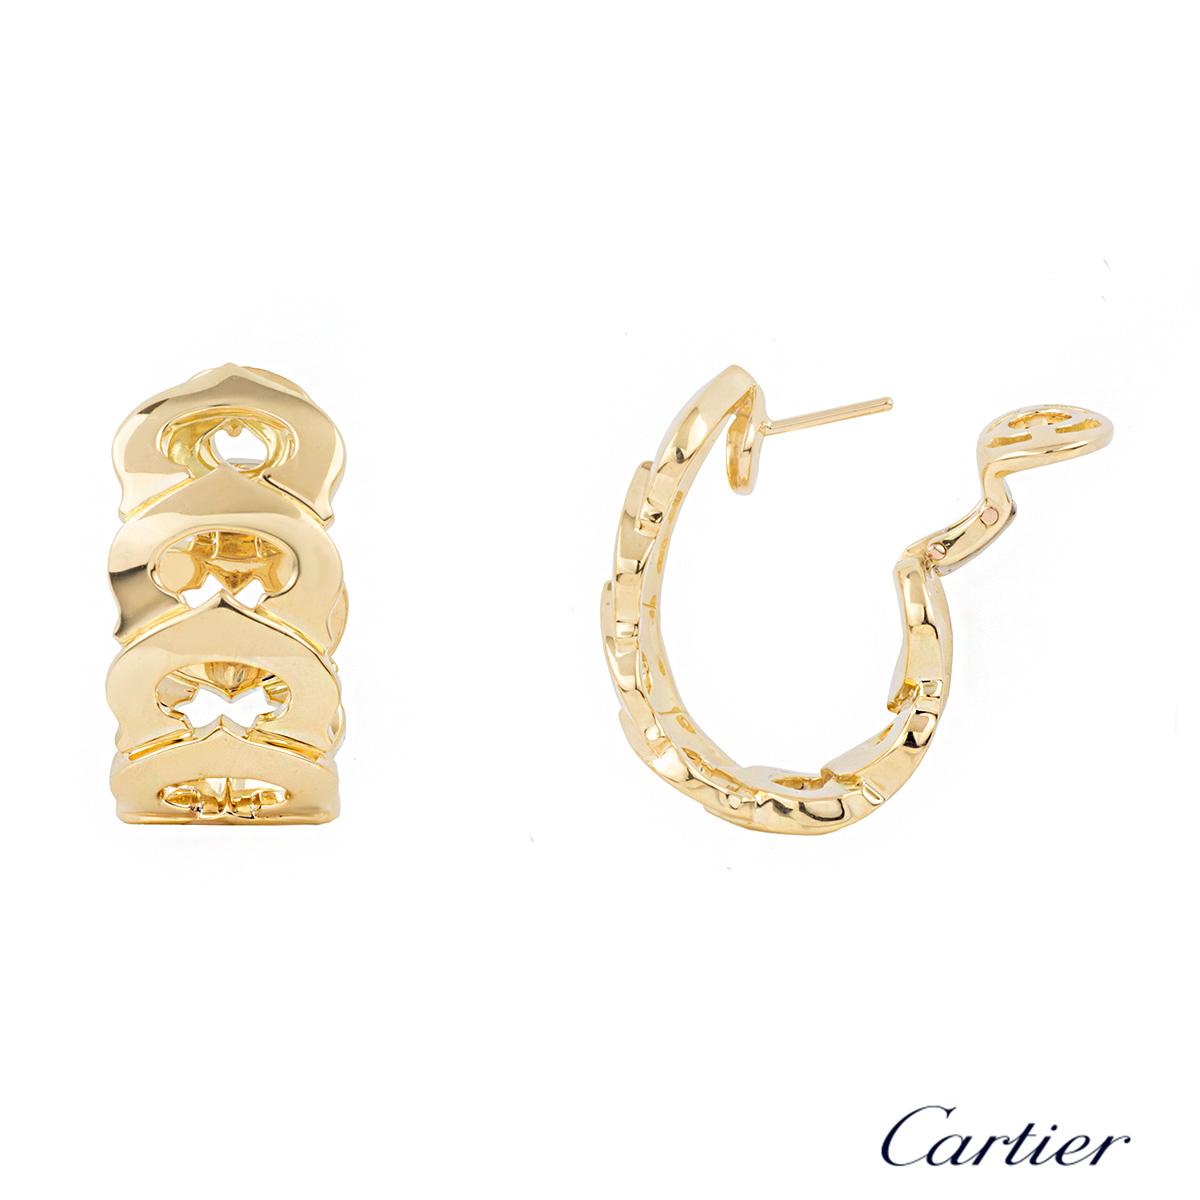 Cartier 18k Yellow Gold C de Cartier Earrings